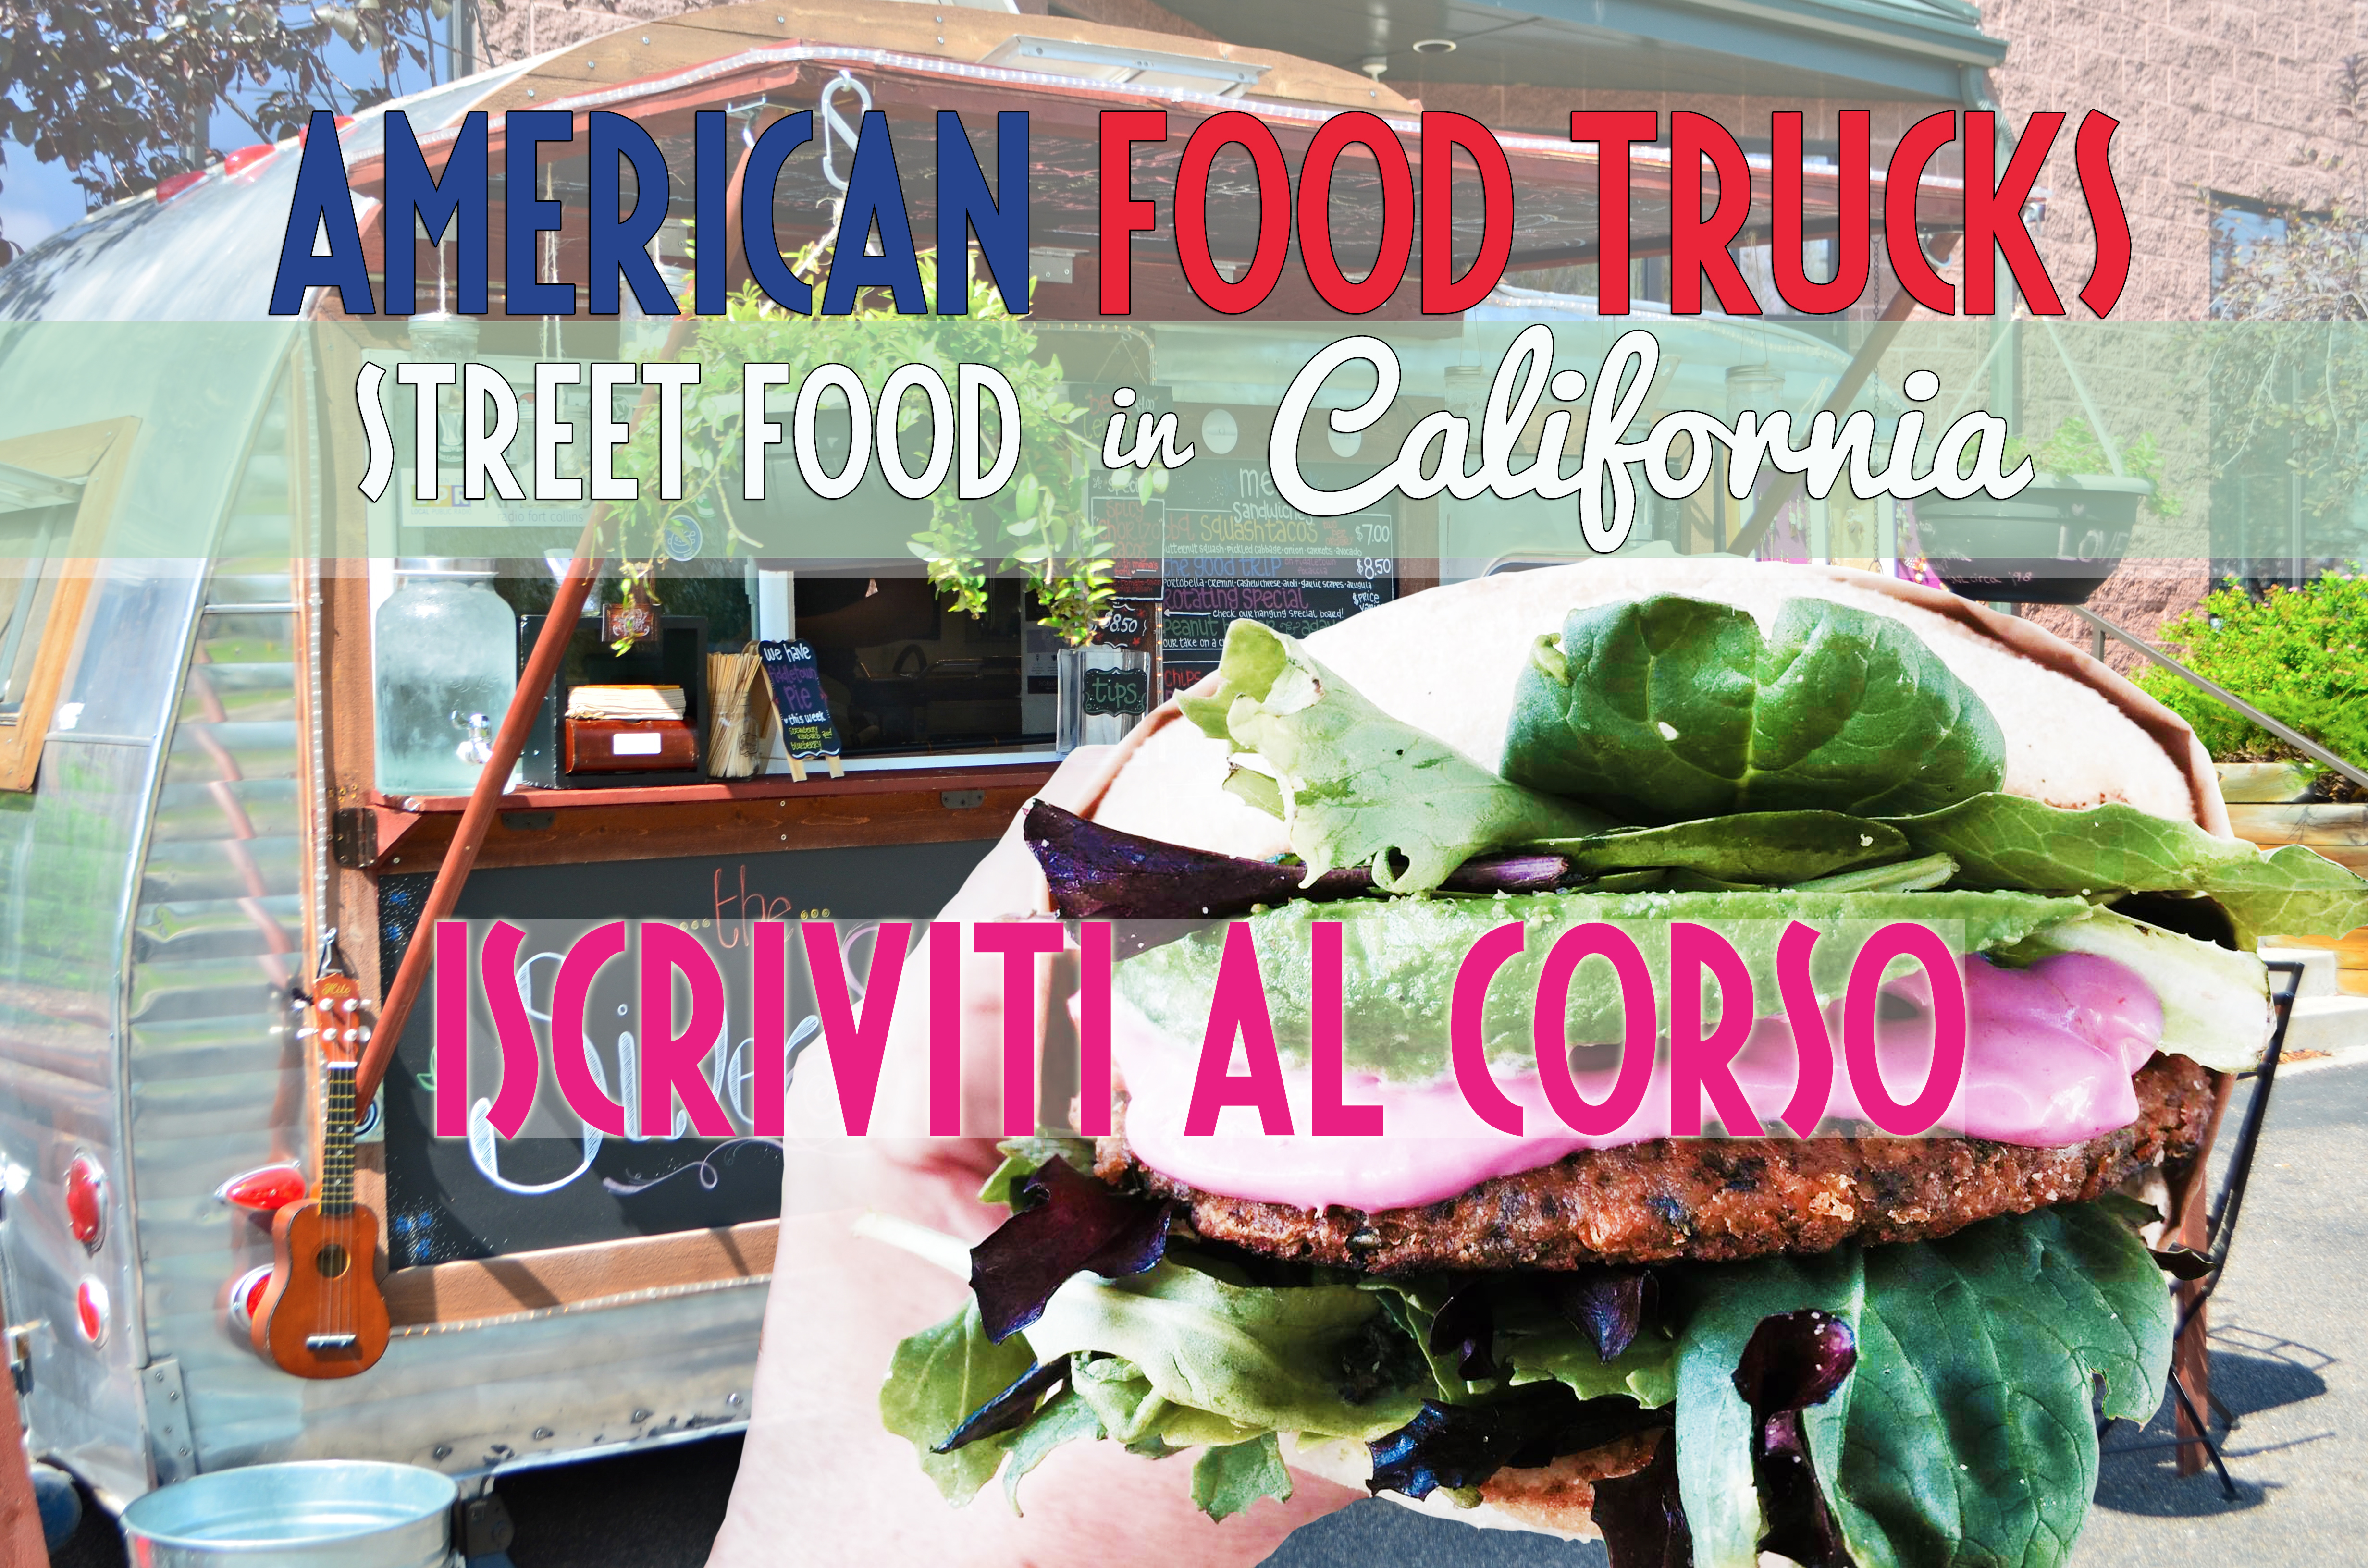 Banner Corso American Street Food - Tweedot blog magazine